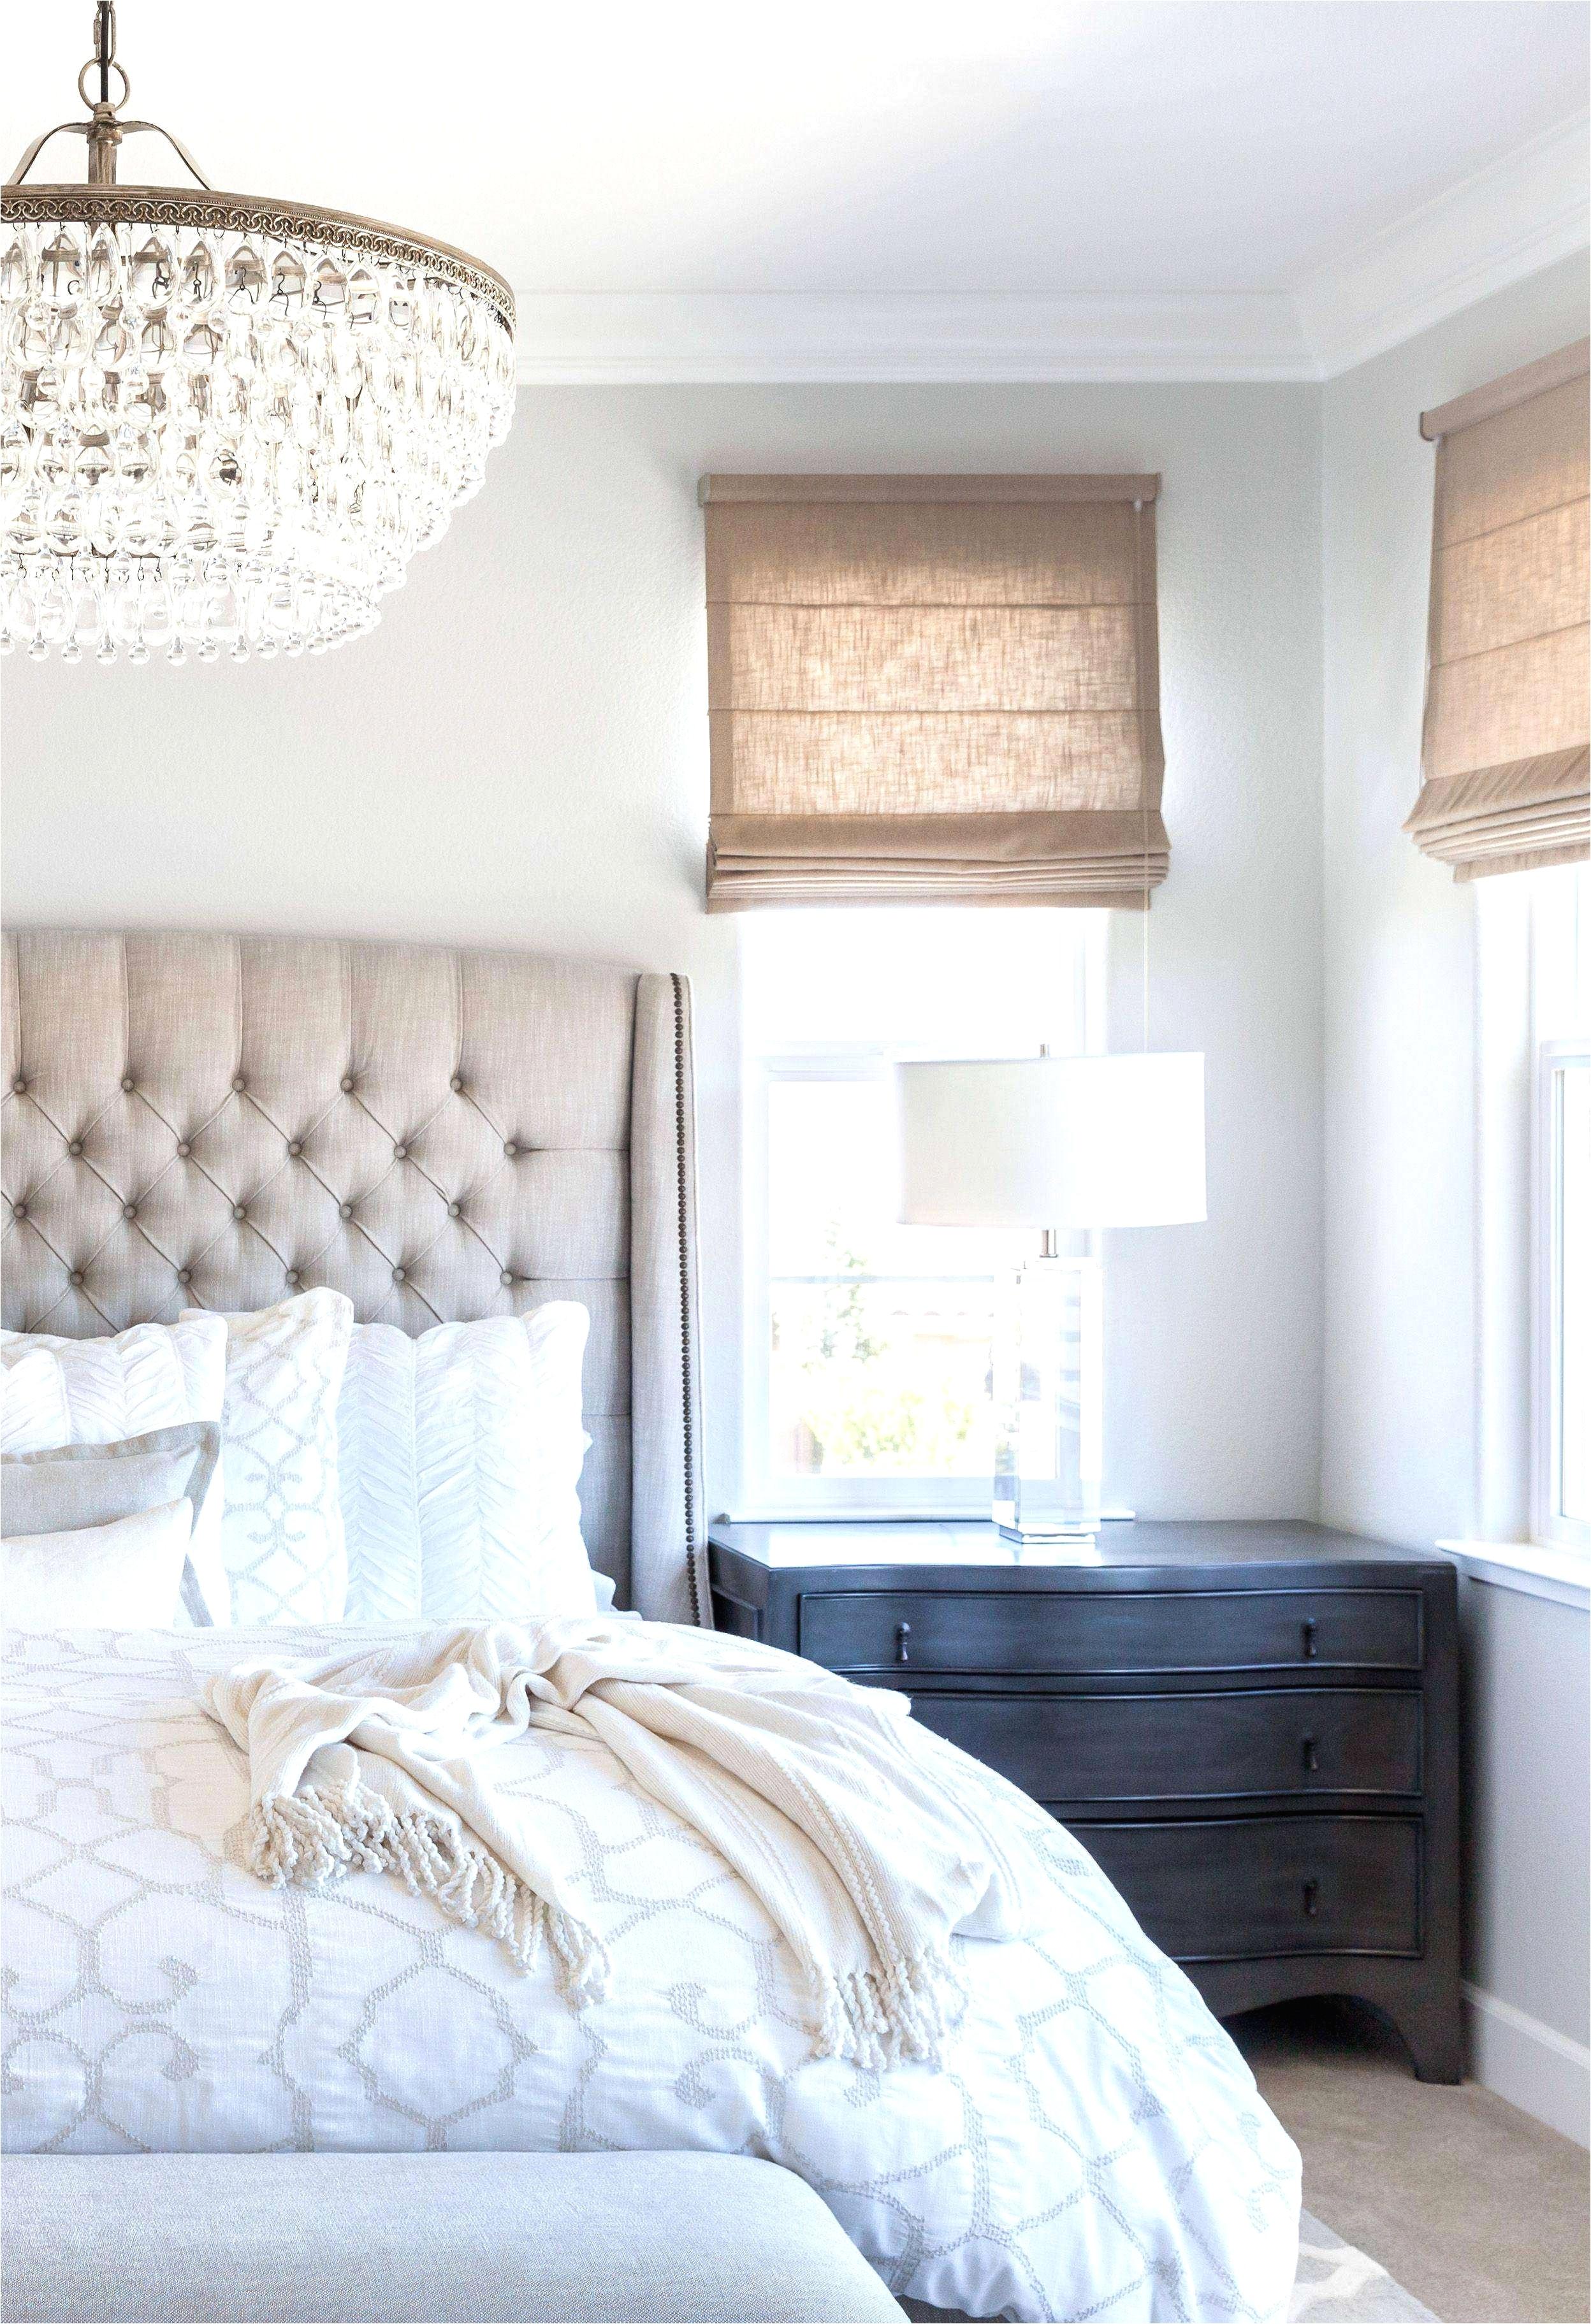 bedroom light ideas inspirational bedroom ideas bed linen luxury bloomingdales mattresses 0d brilliant wall